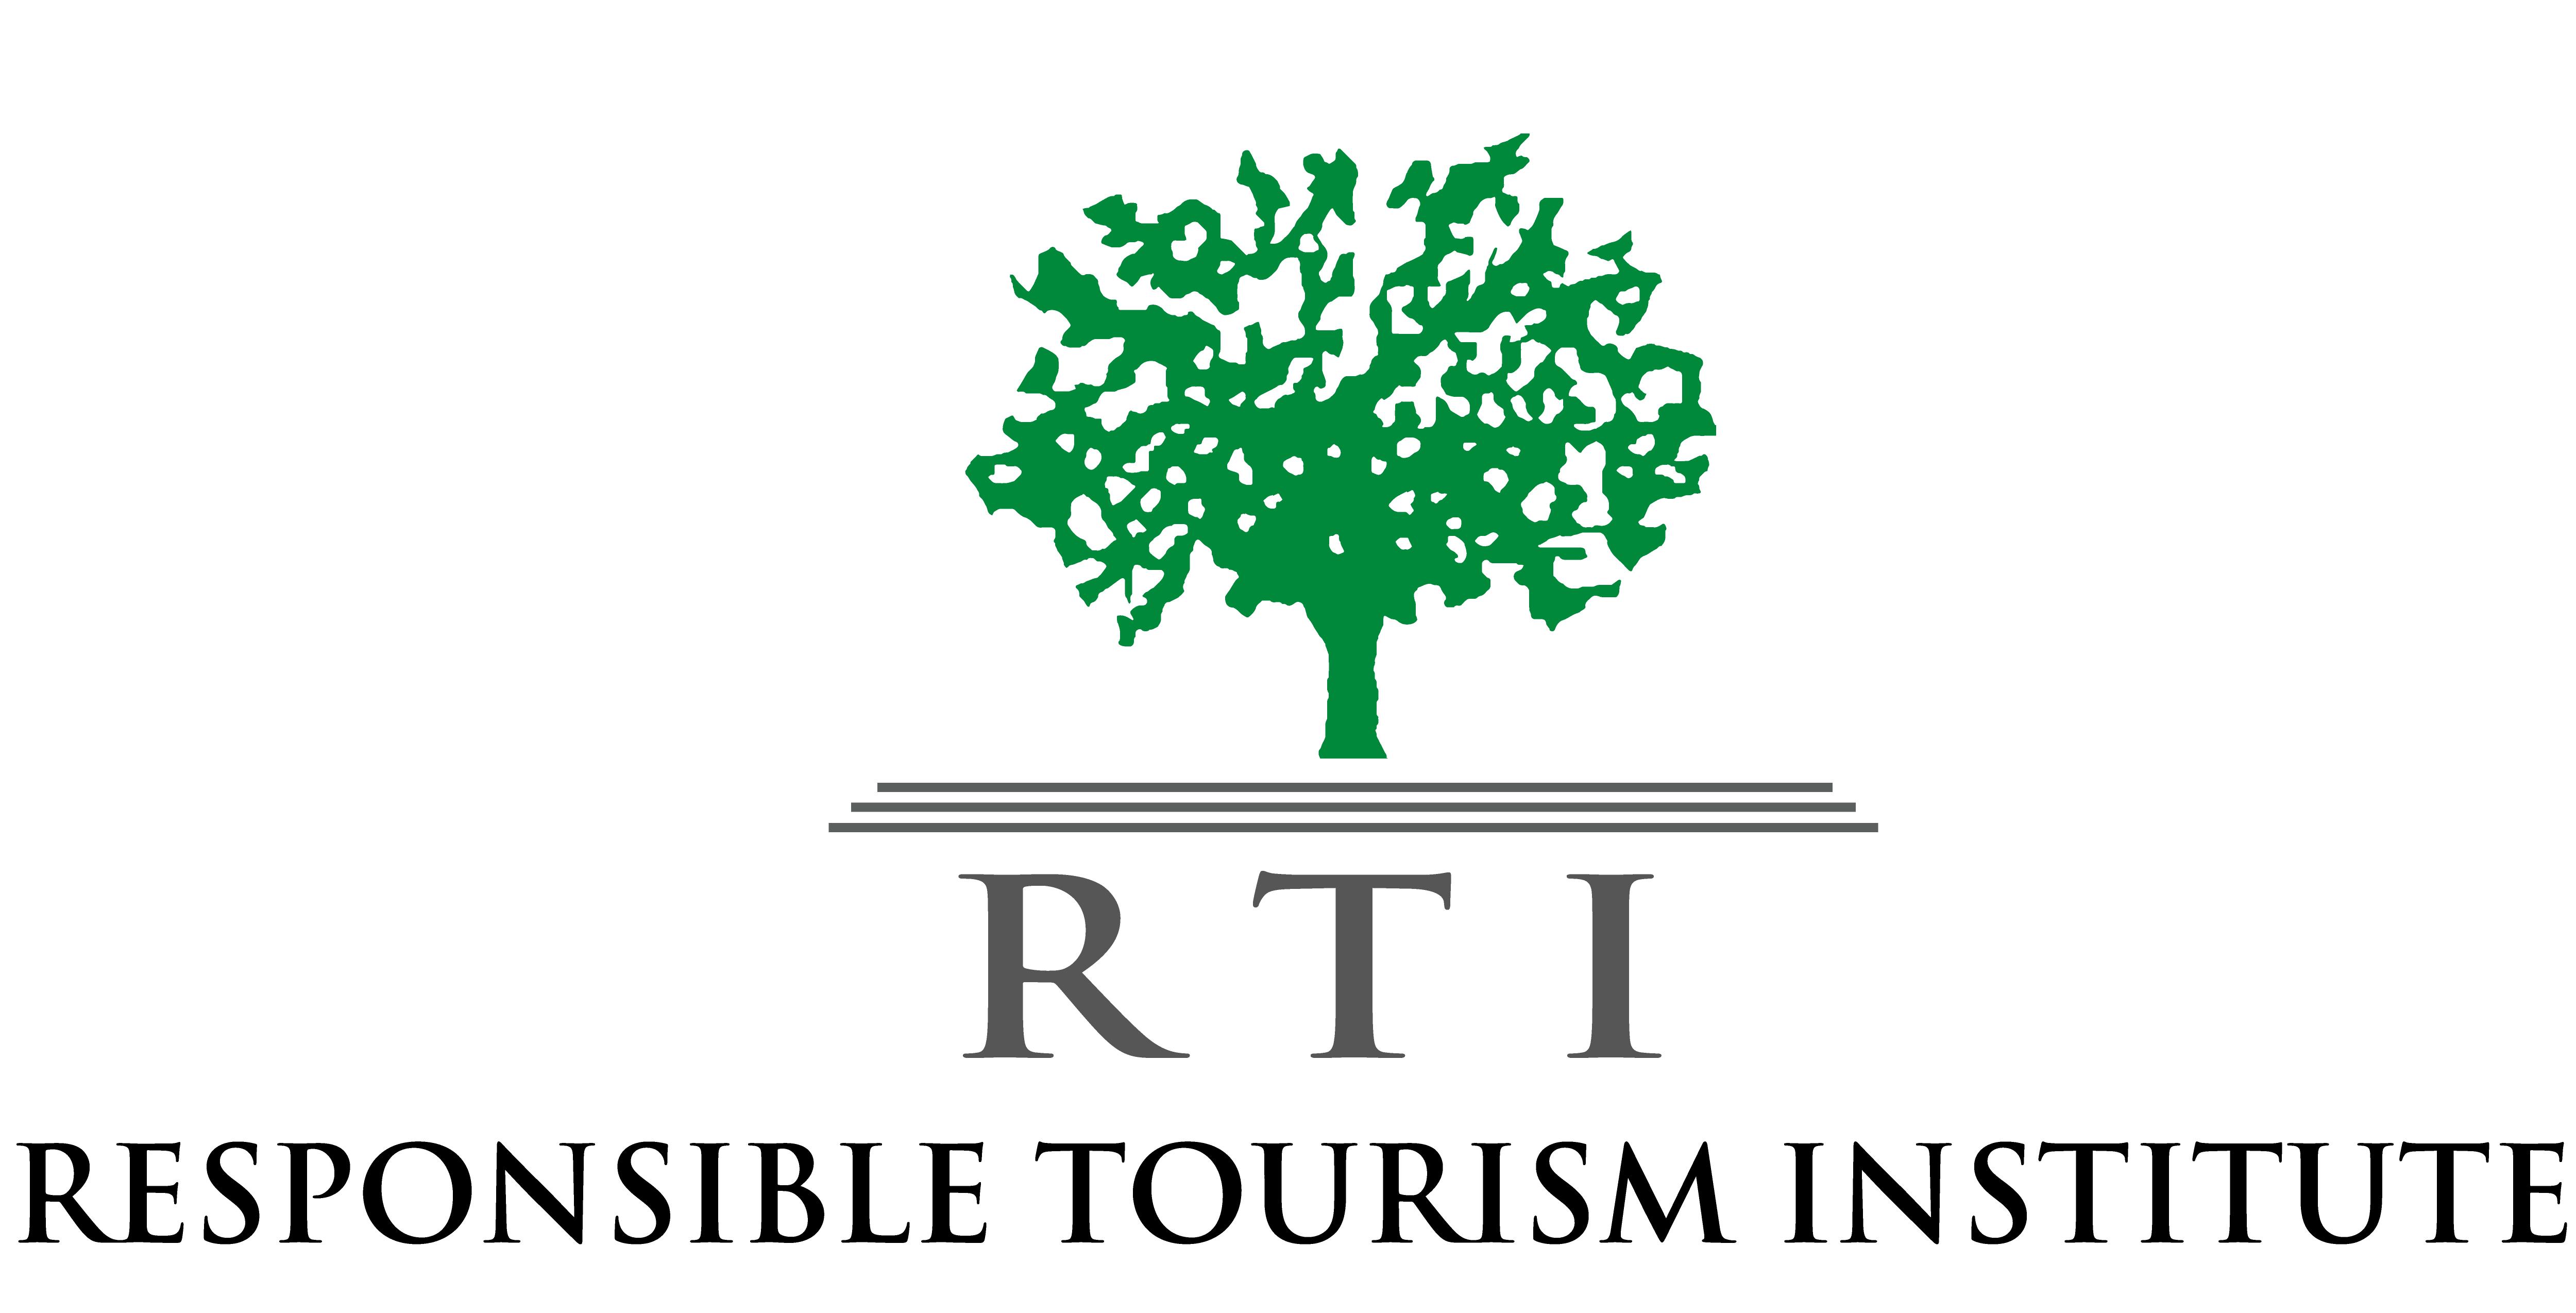 Instituto de Turismo Responsable Logo